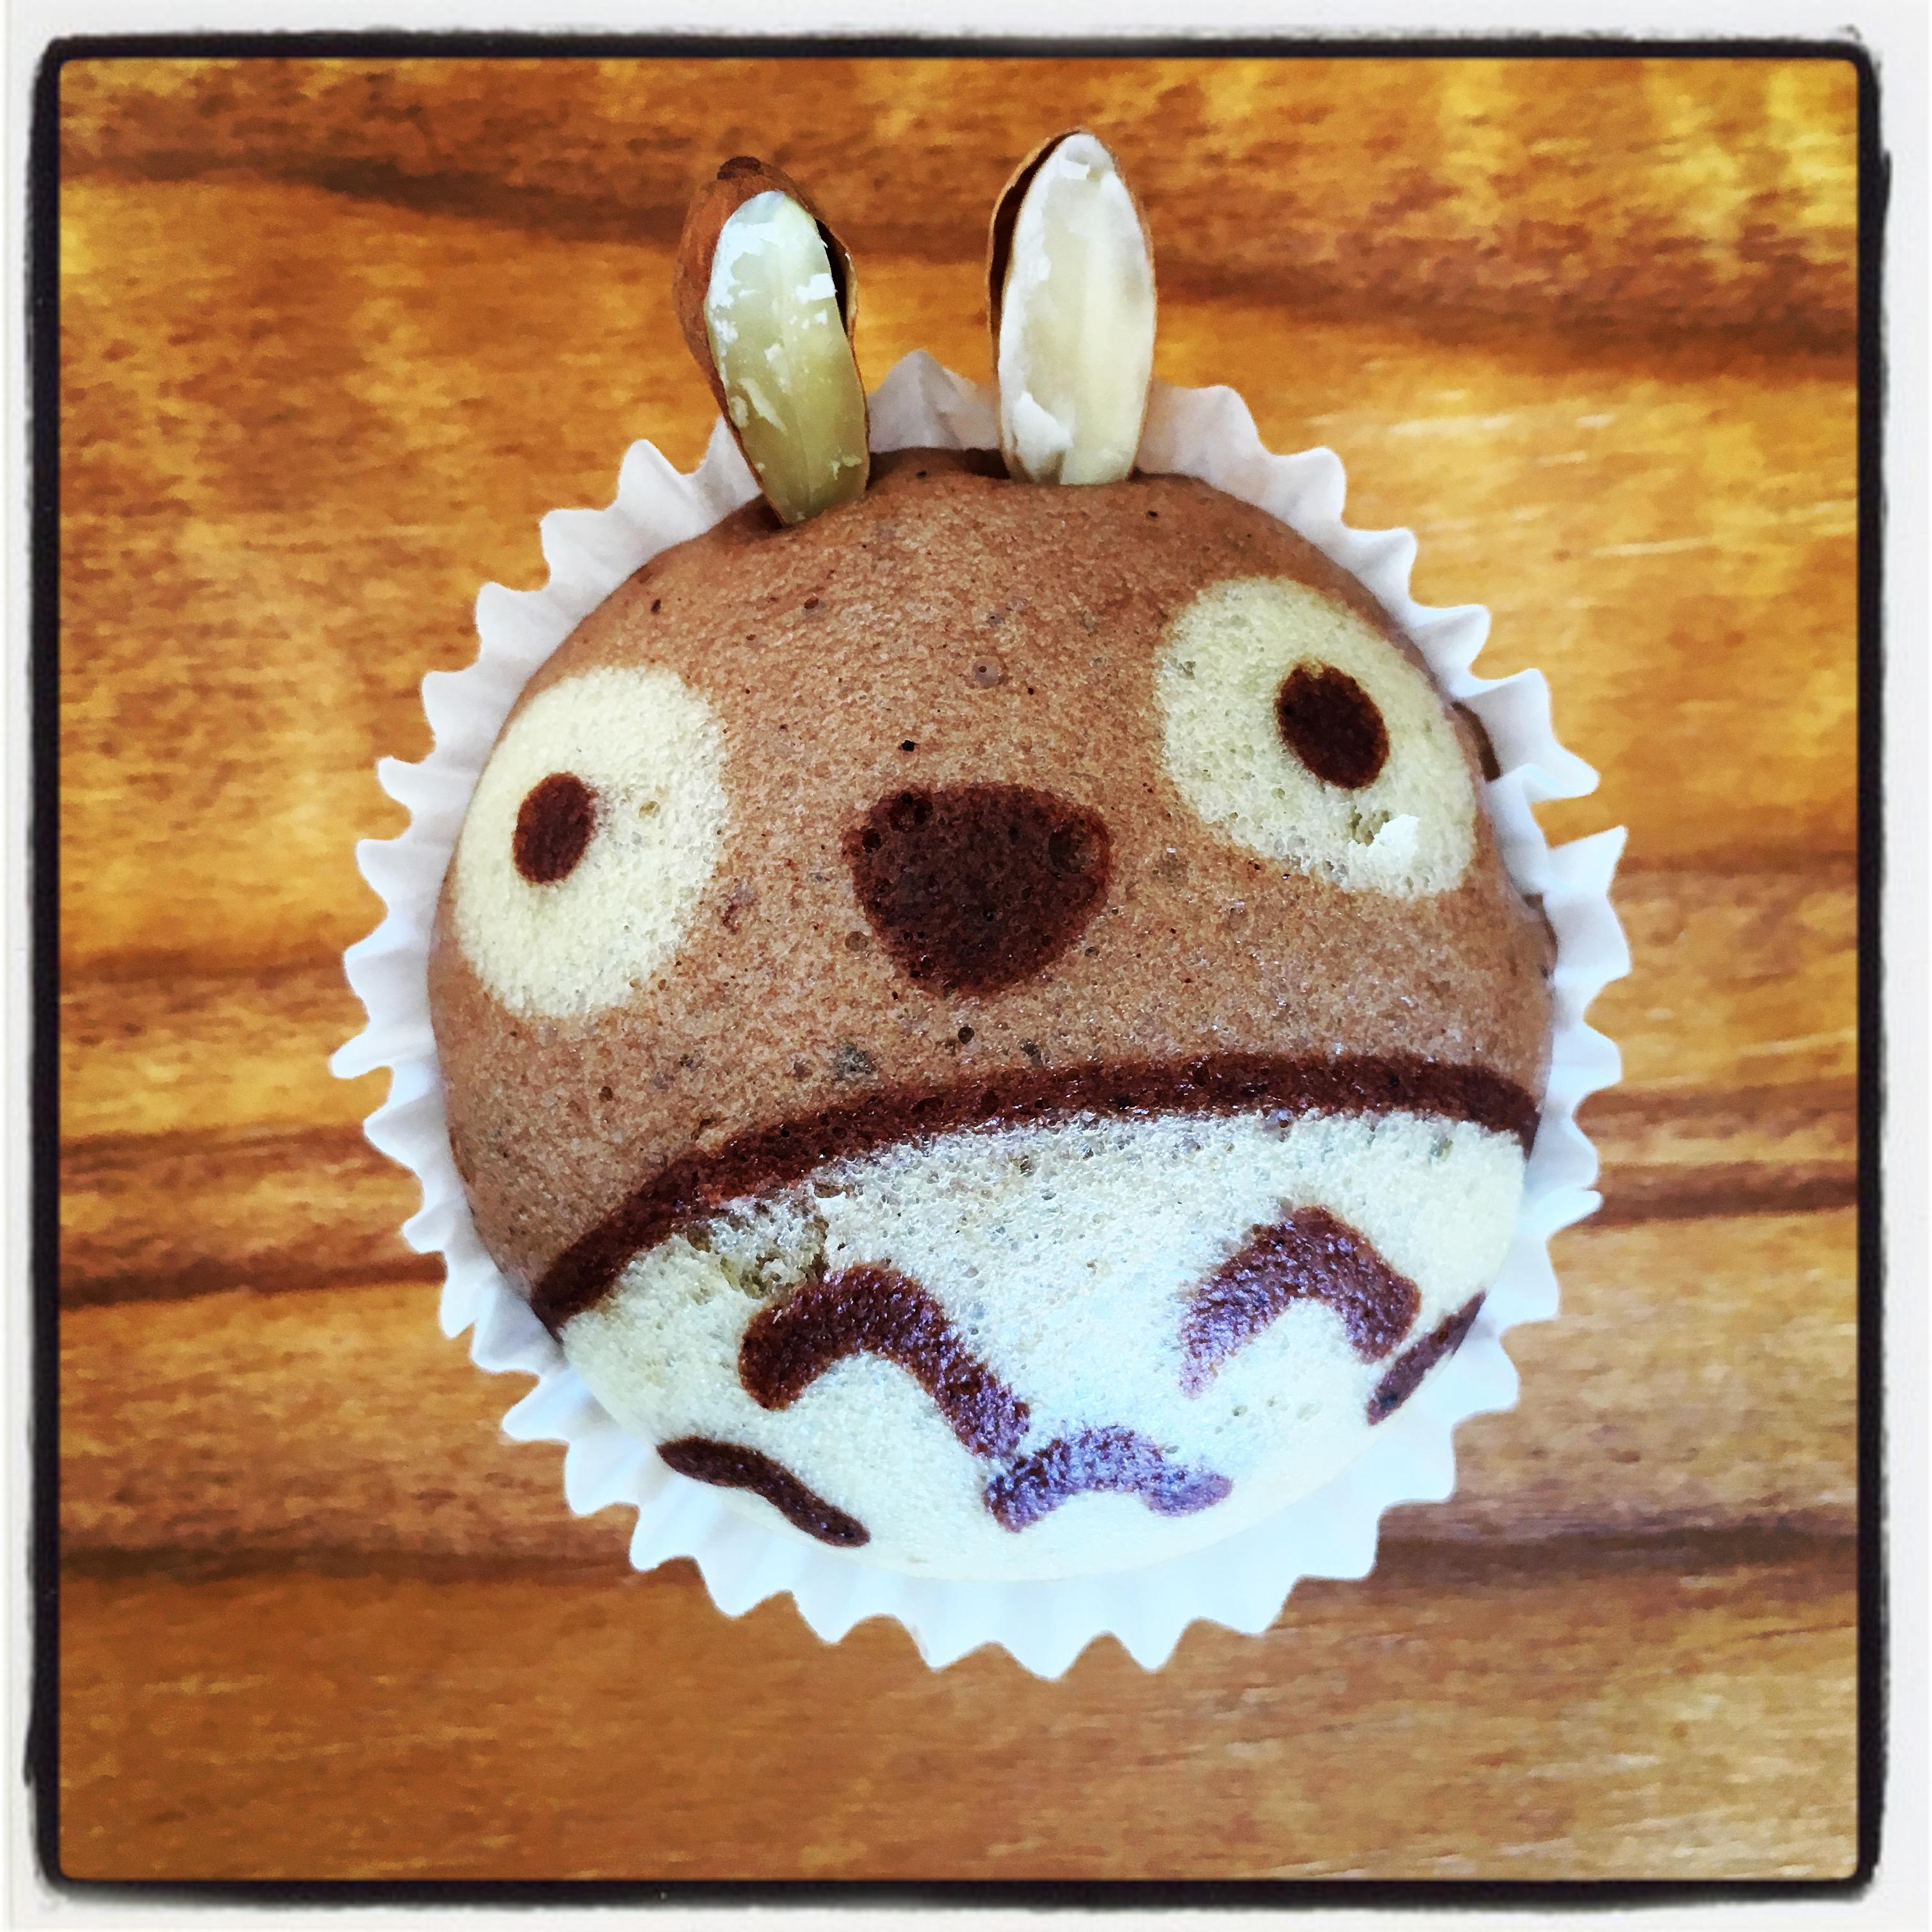 Recetas japonesas: Como preparar Mushipan de Totoro | Taka Sasaki